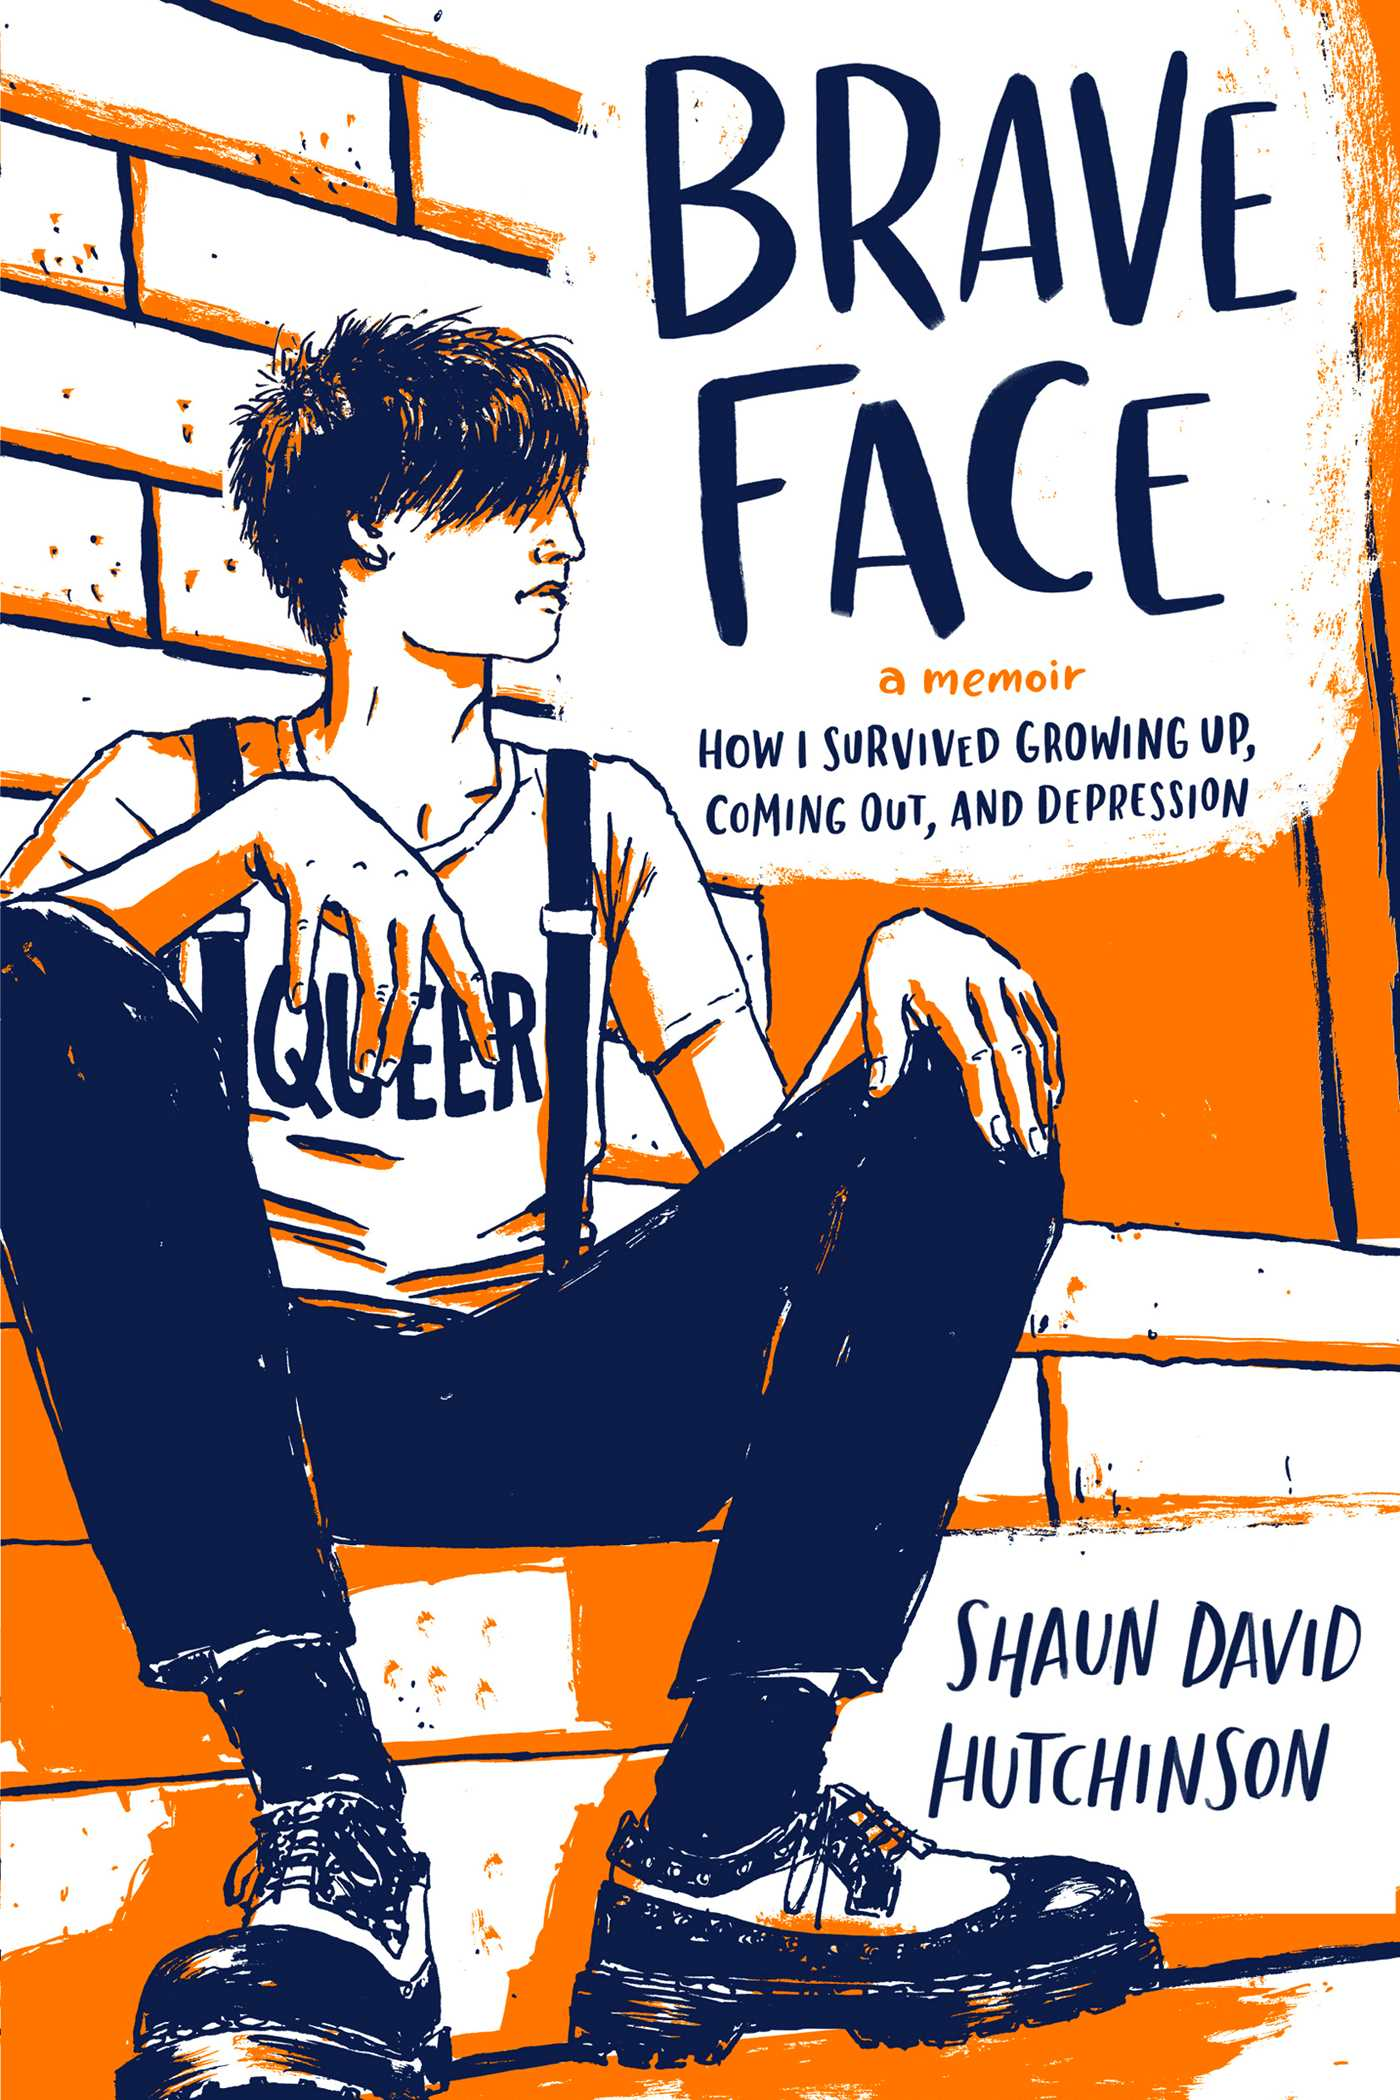 Brave face a memoir cover image